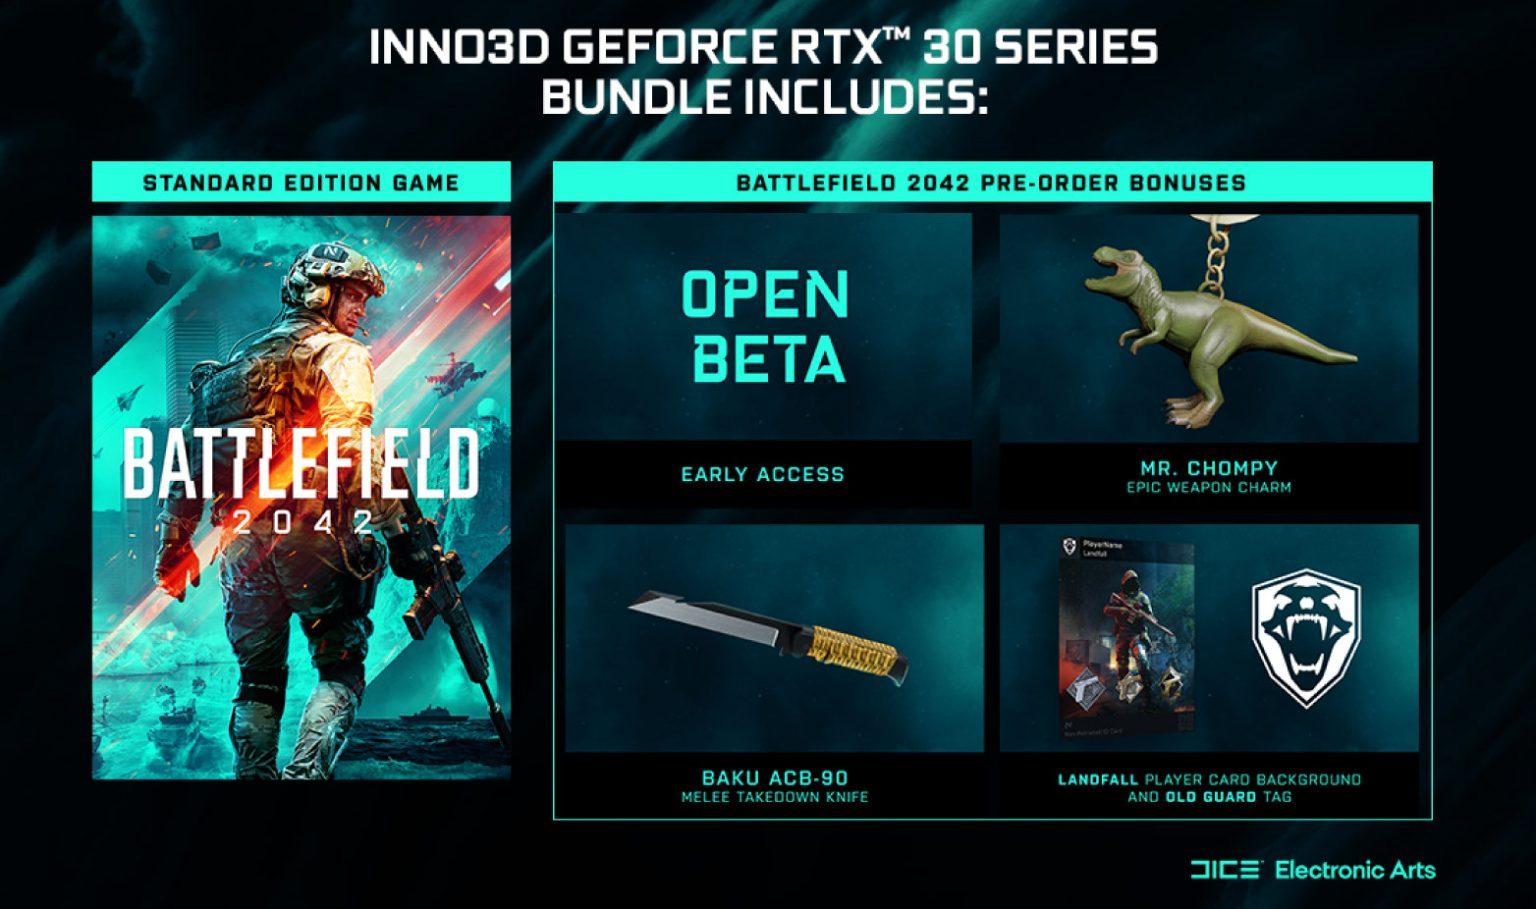 NVIDIA-RTX-30-Battlefield-2042-2.jpg